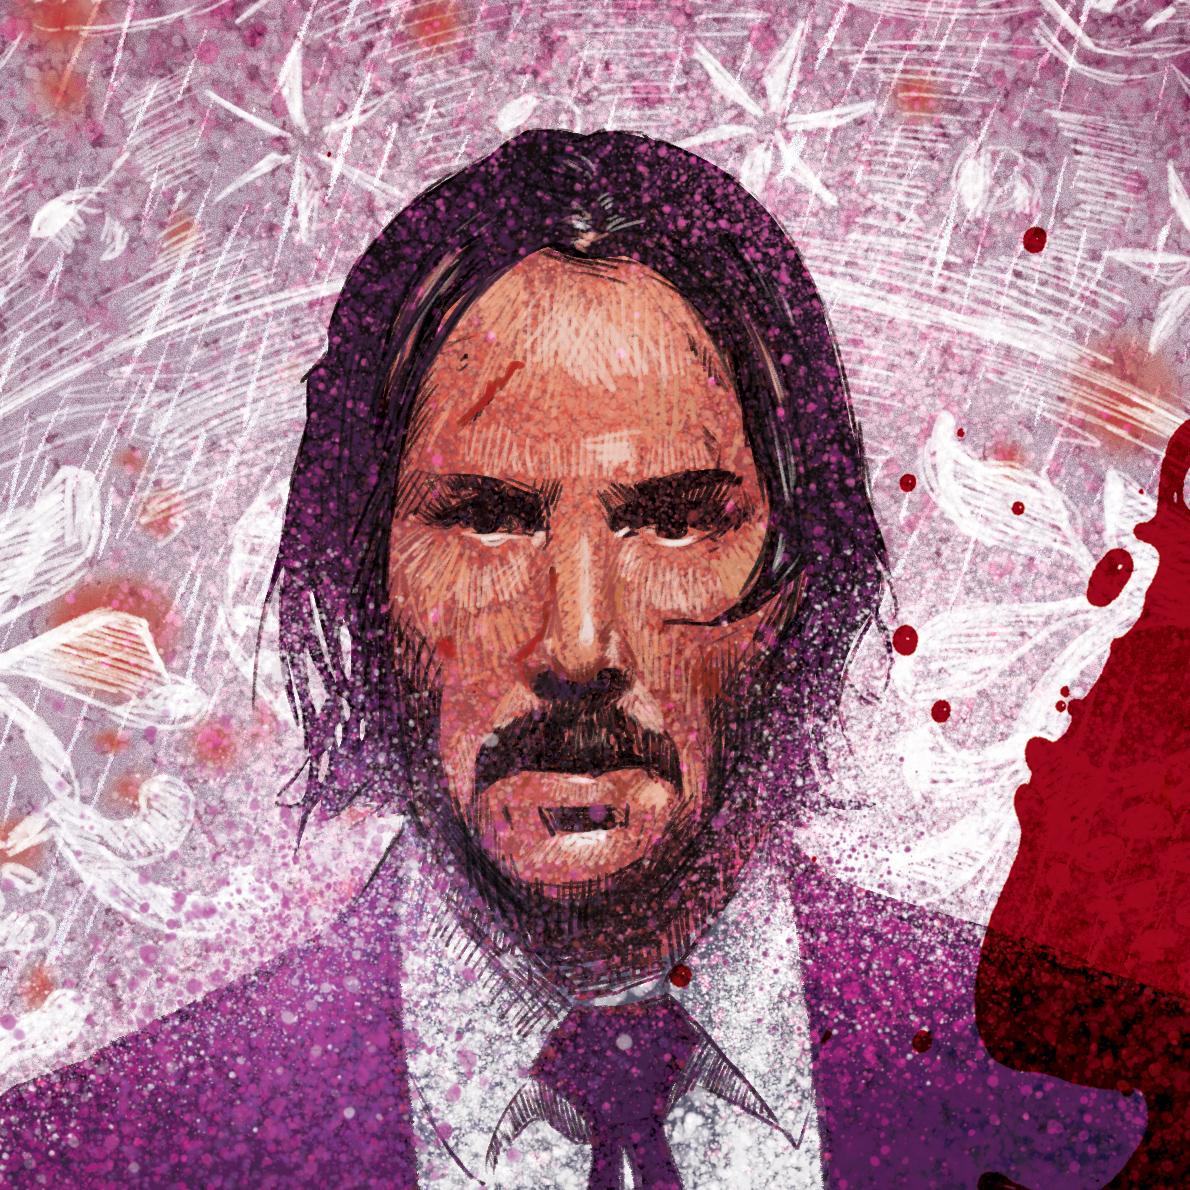 John Wick 3 alternative poster detail by @markLevyArt